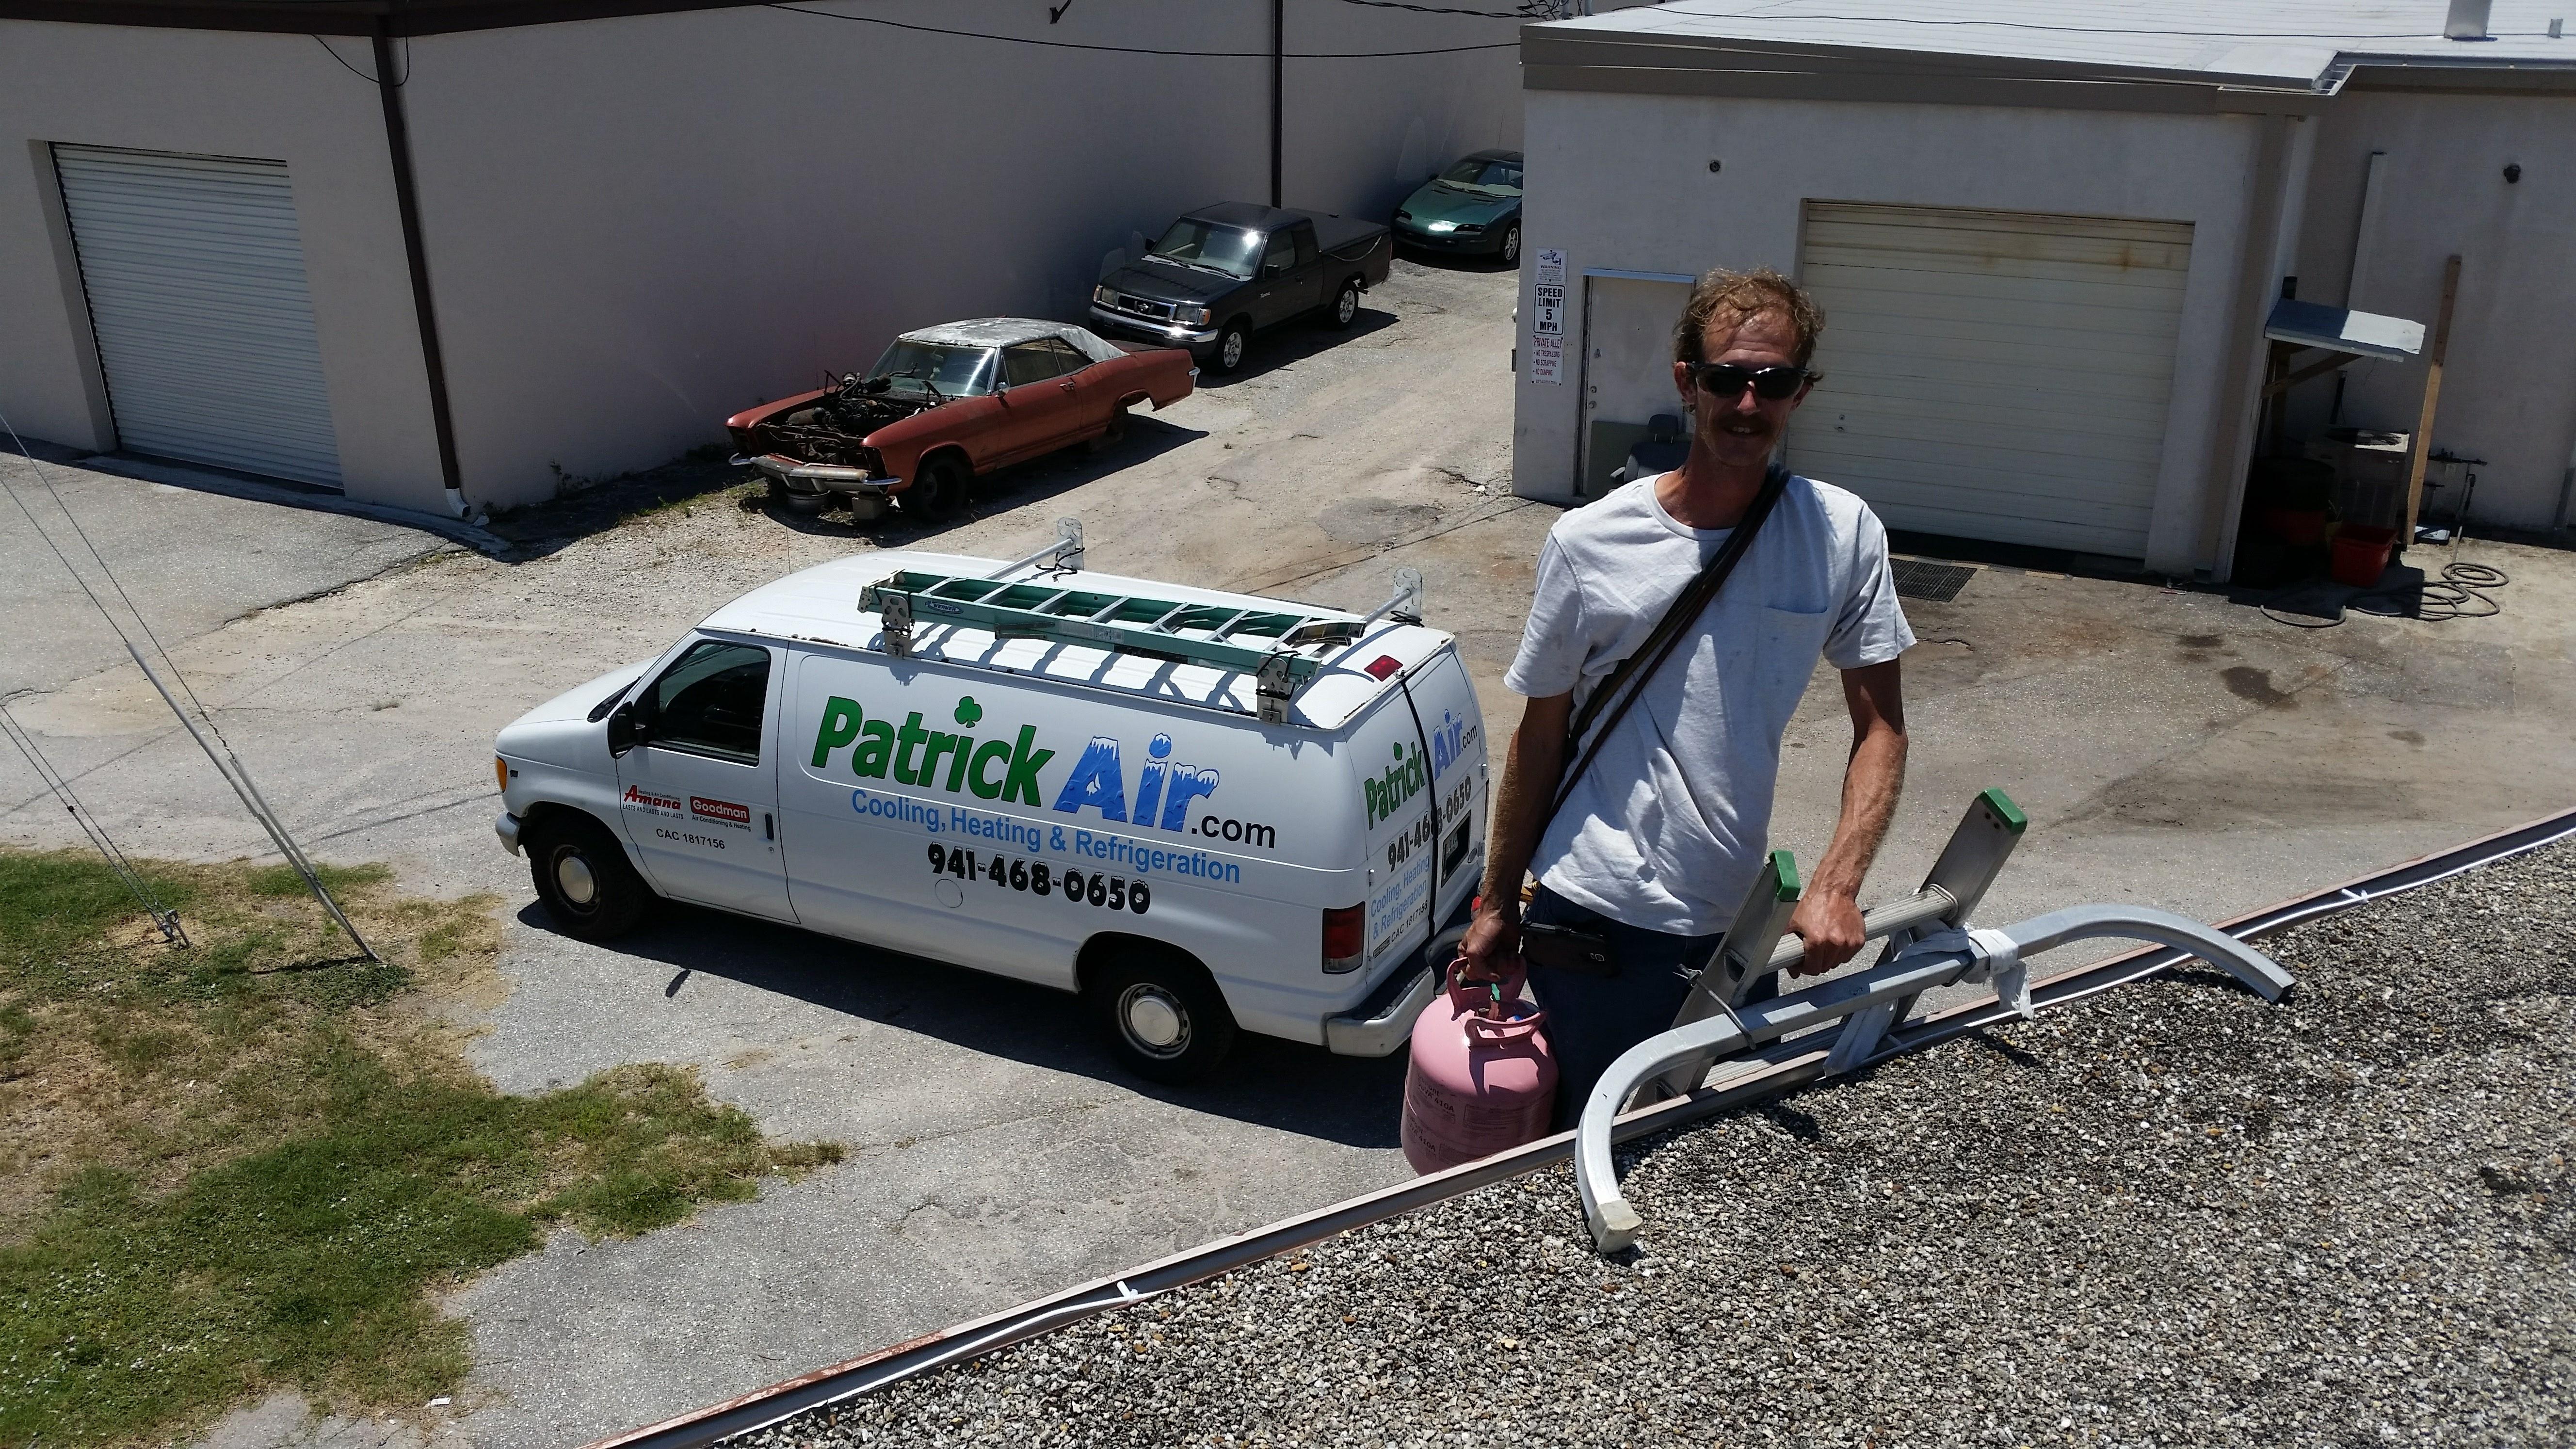 PatrickAir Commercial Maintenance Venice, FL